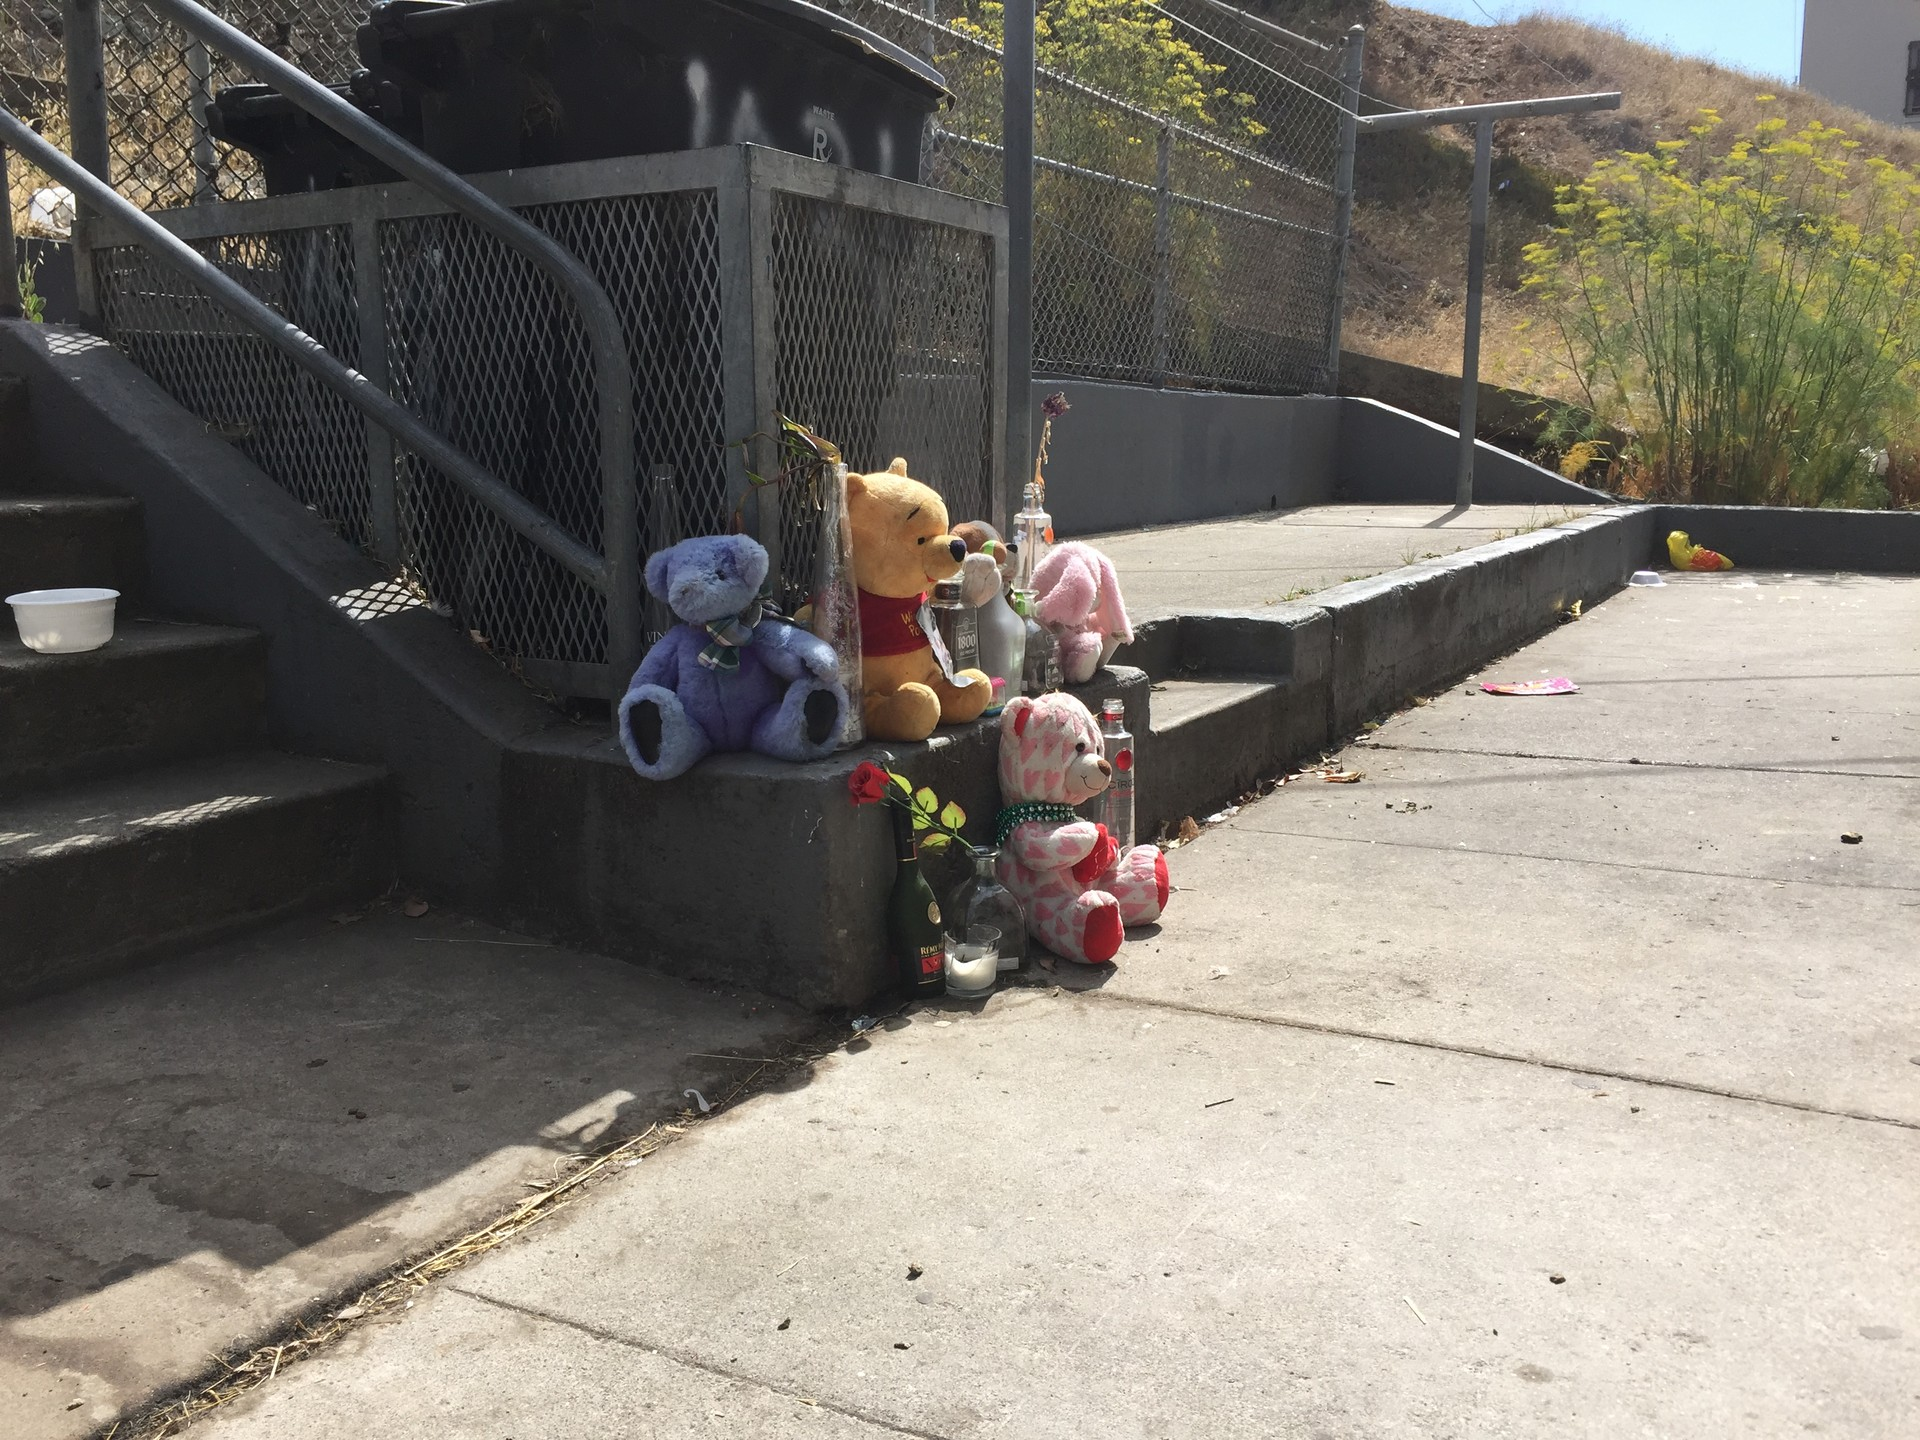 A shrine on the 1000 block of Connecticut Street, in Potrero Terrace.